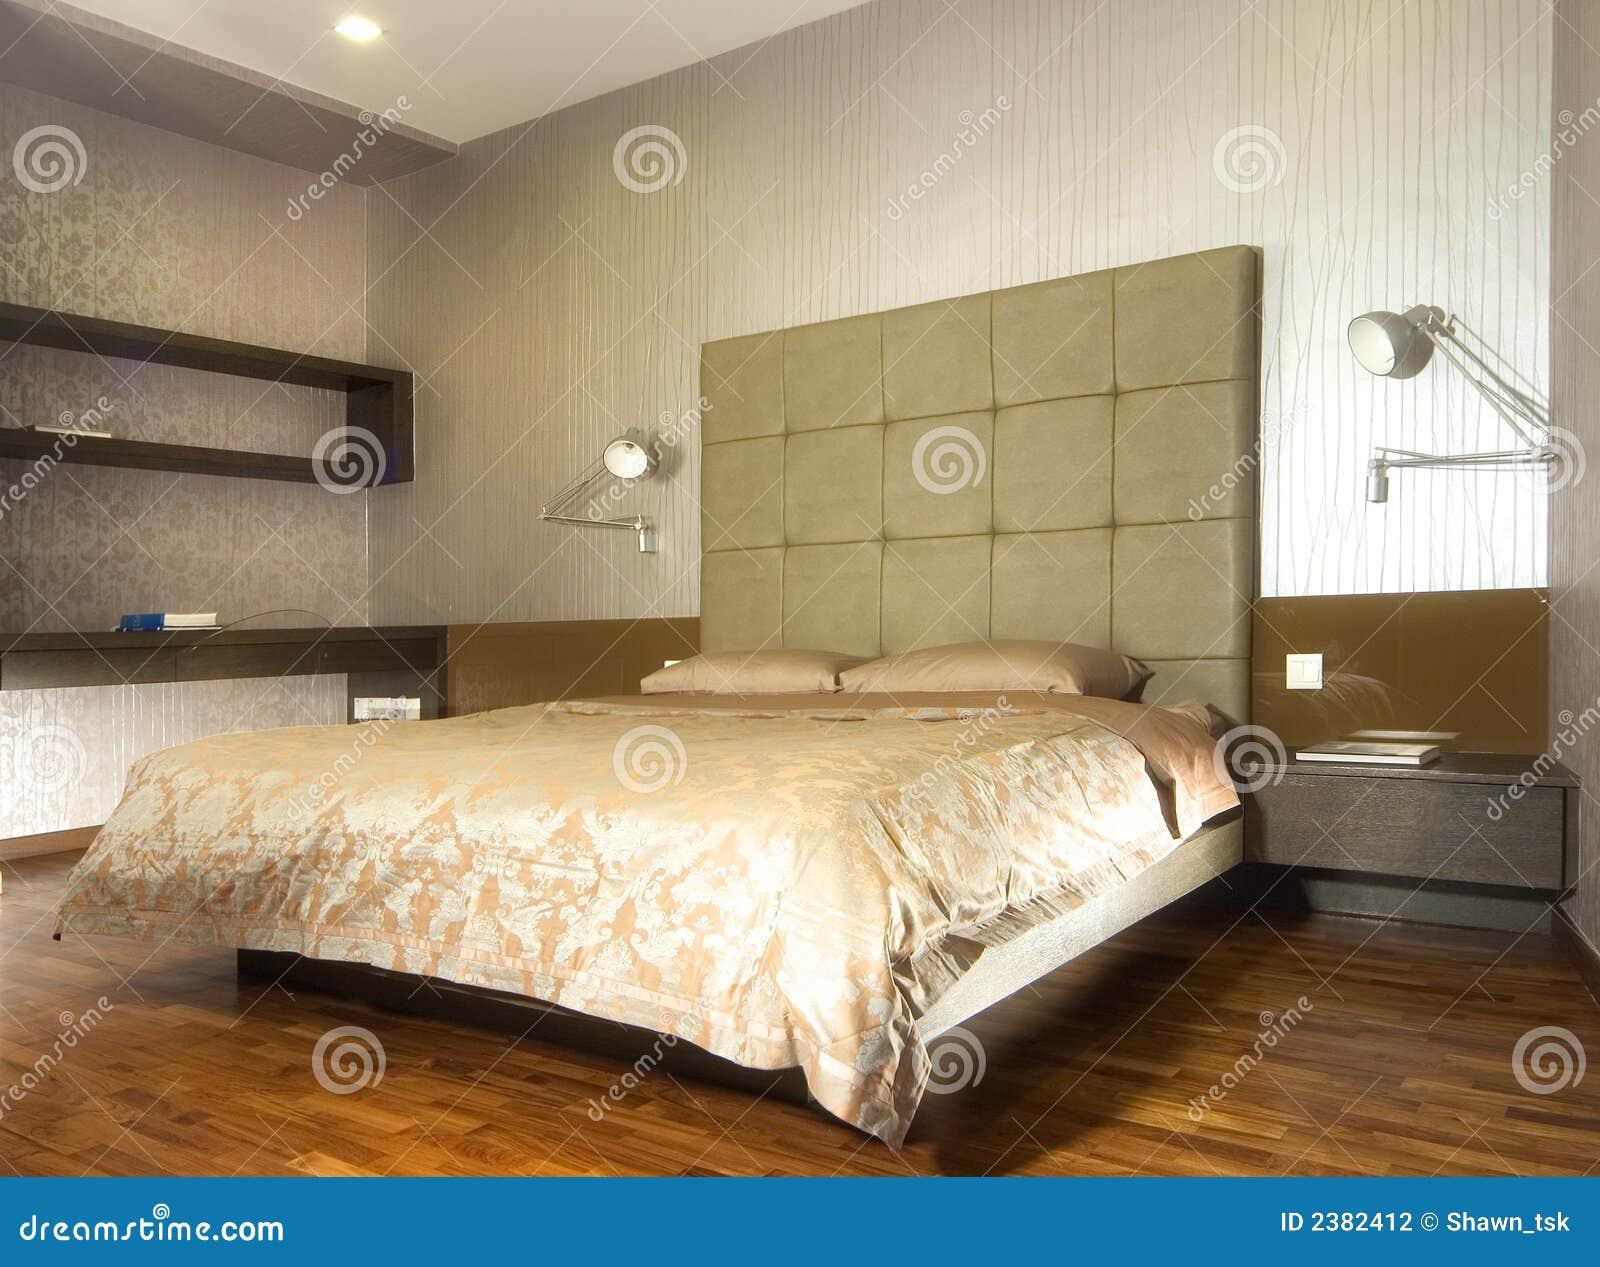 Images about slaapkamer ontwerp on pinterest interieur van and h ...